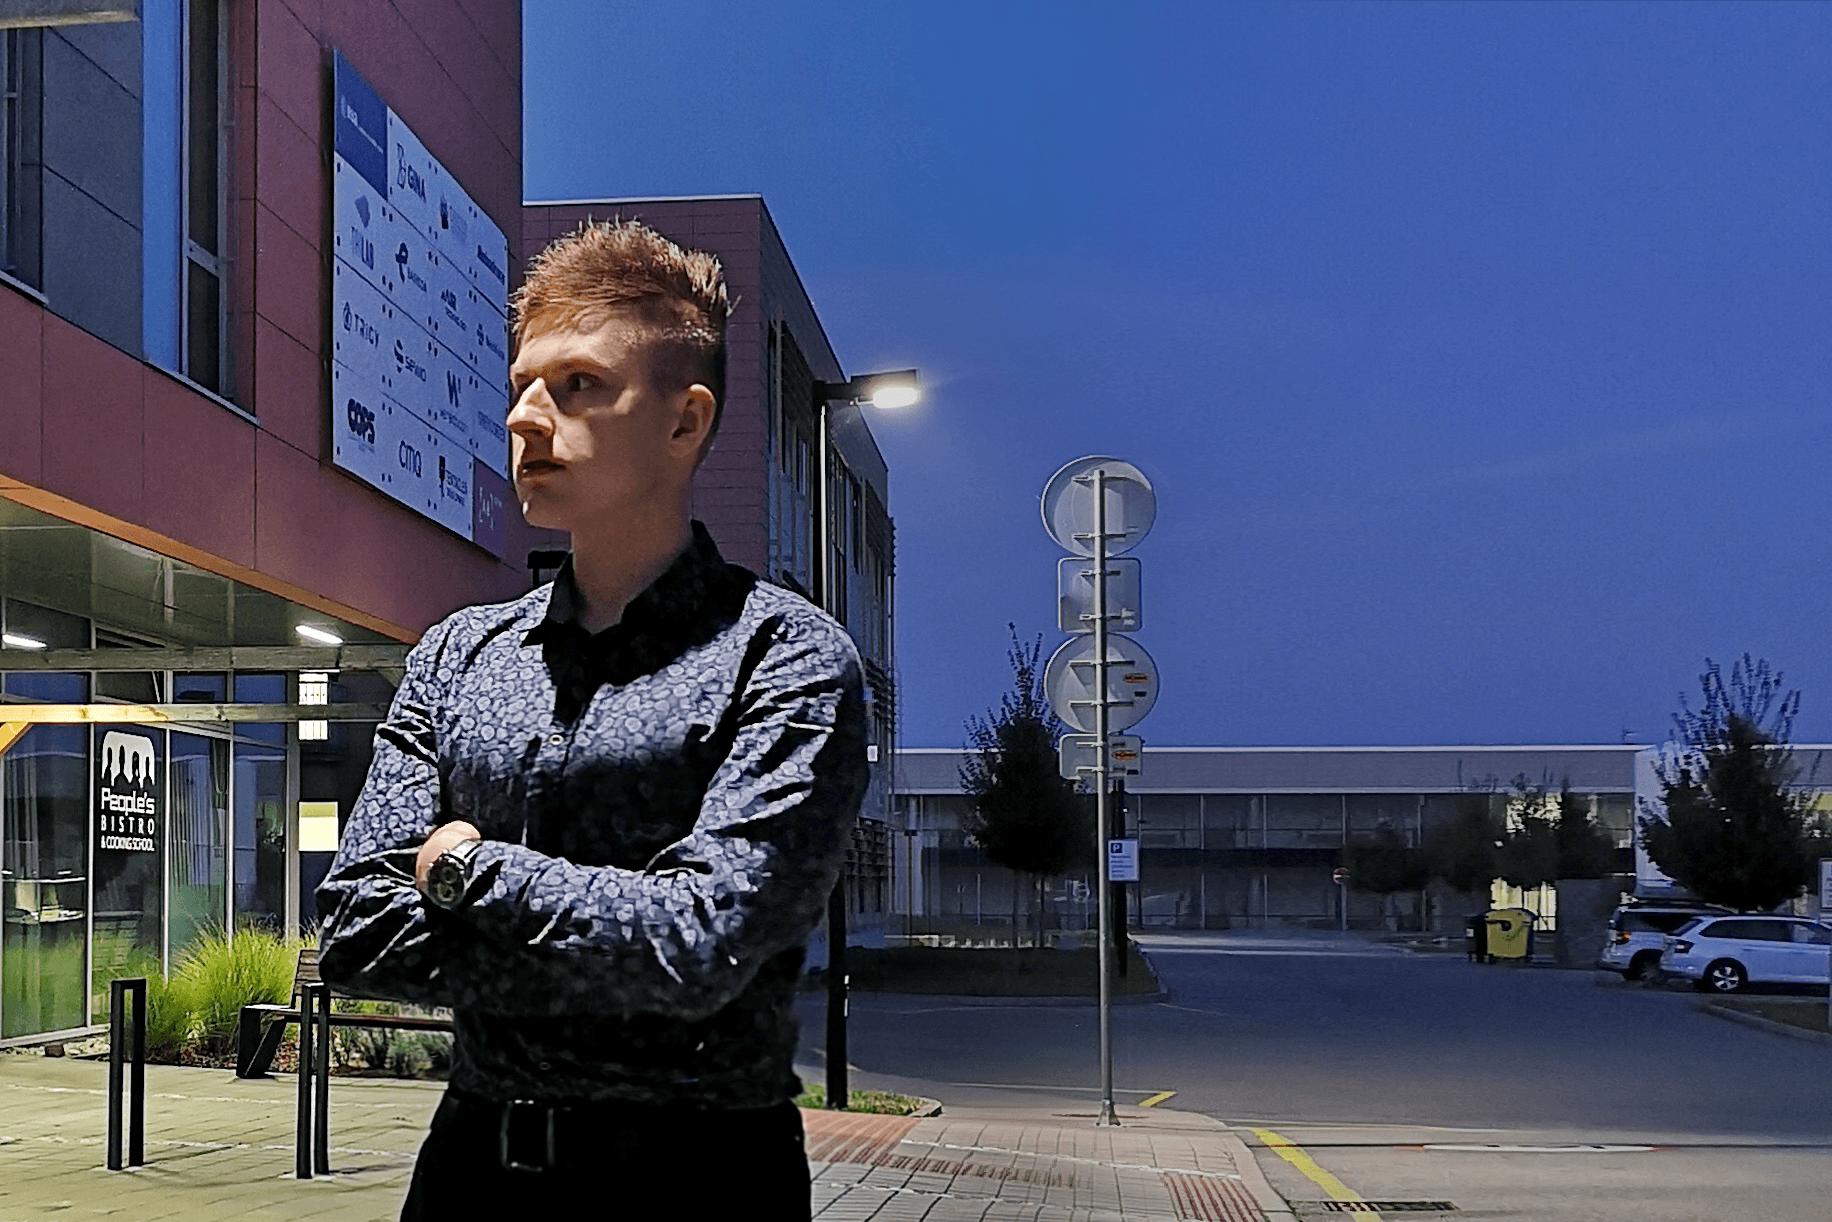 Pokorný Petr TITC noc Brno 2019